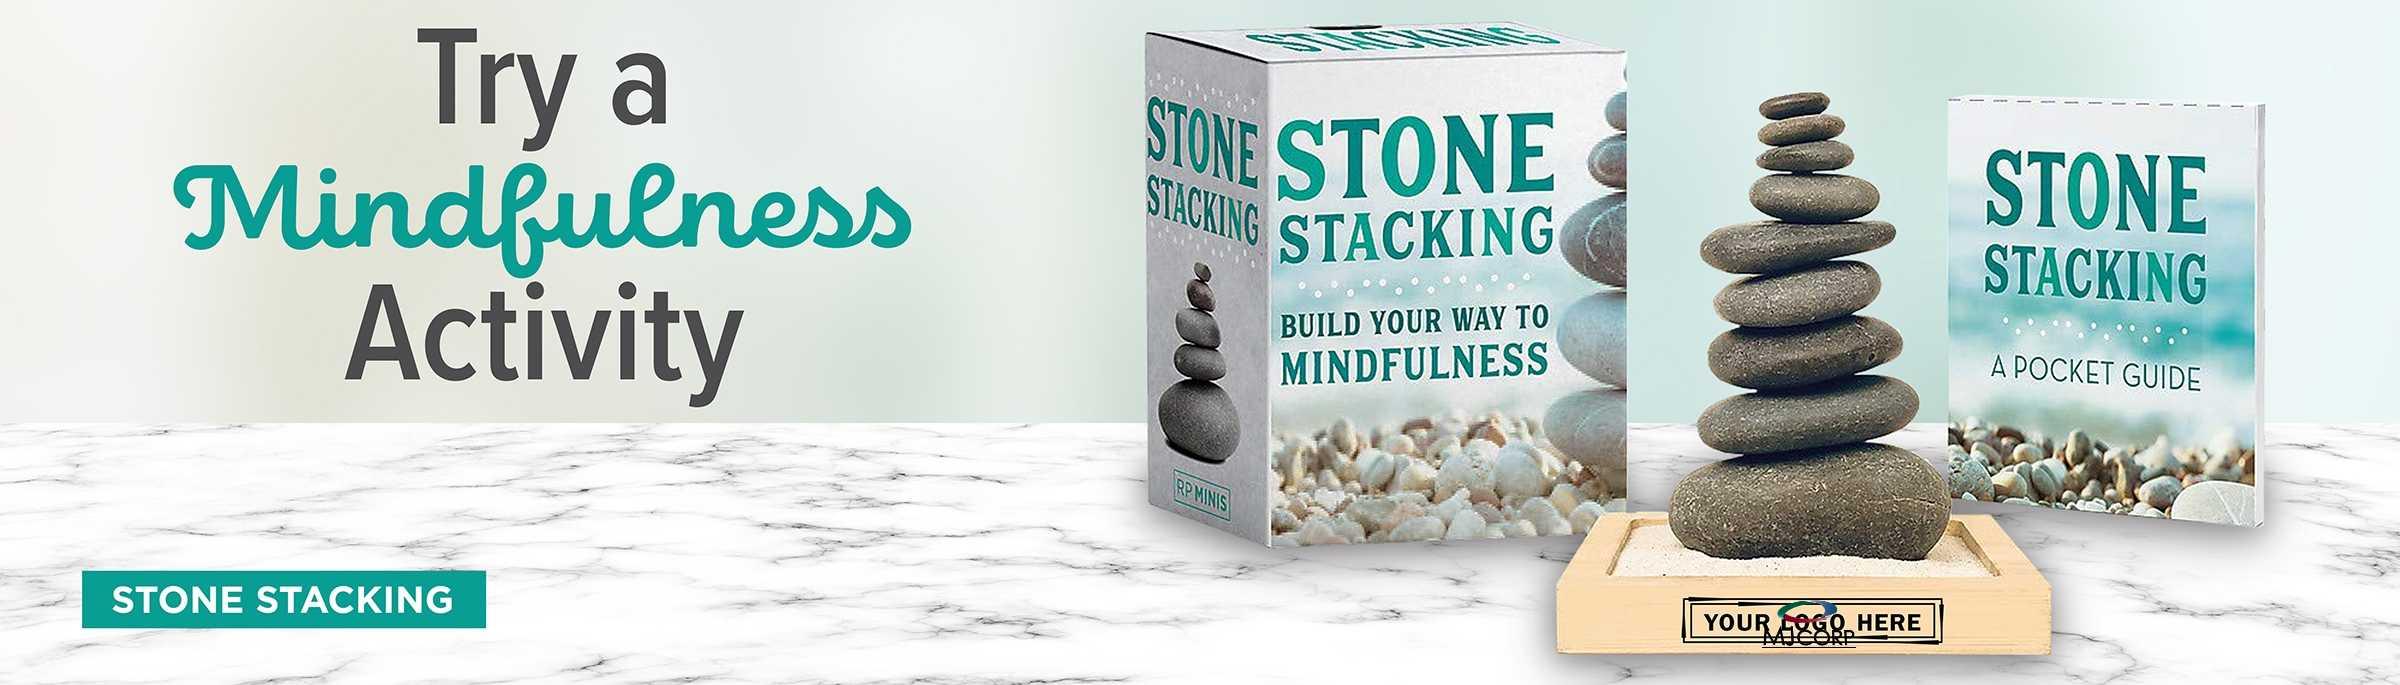 Stone Stacking AIM